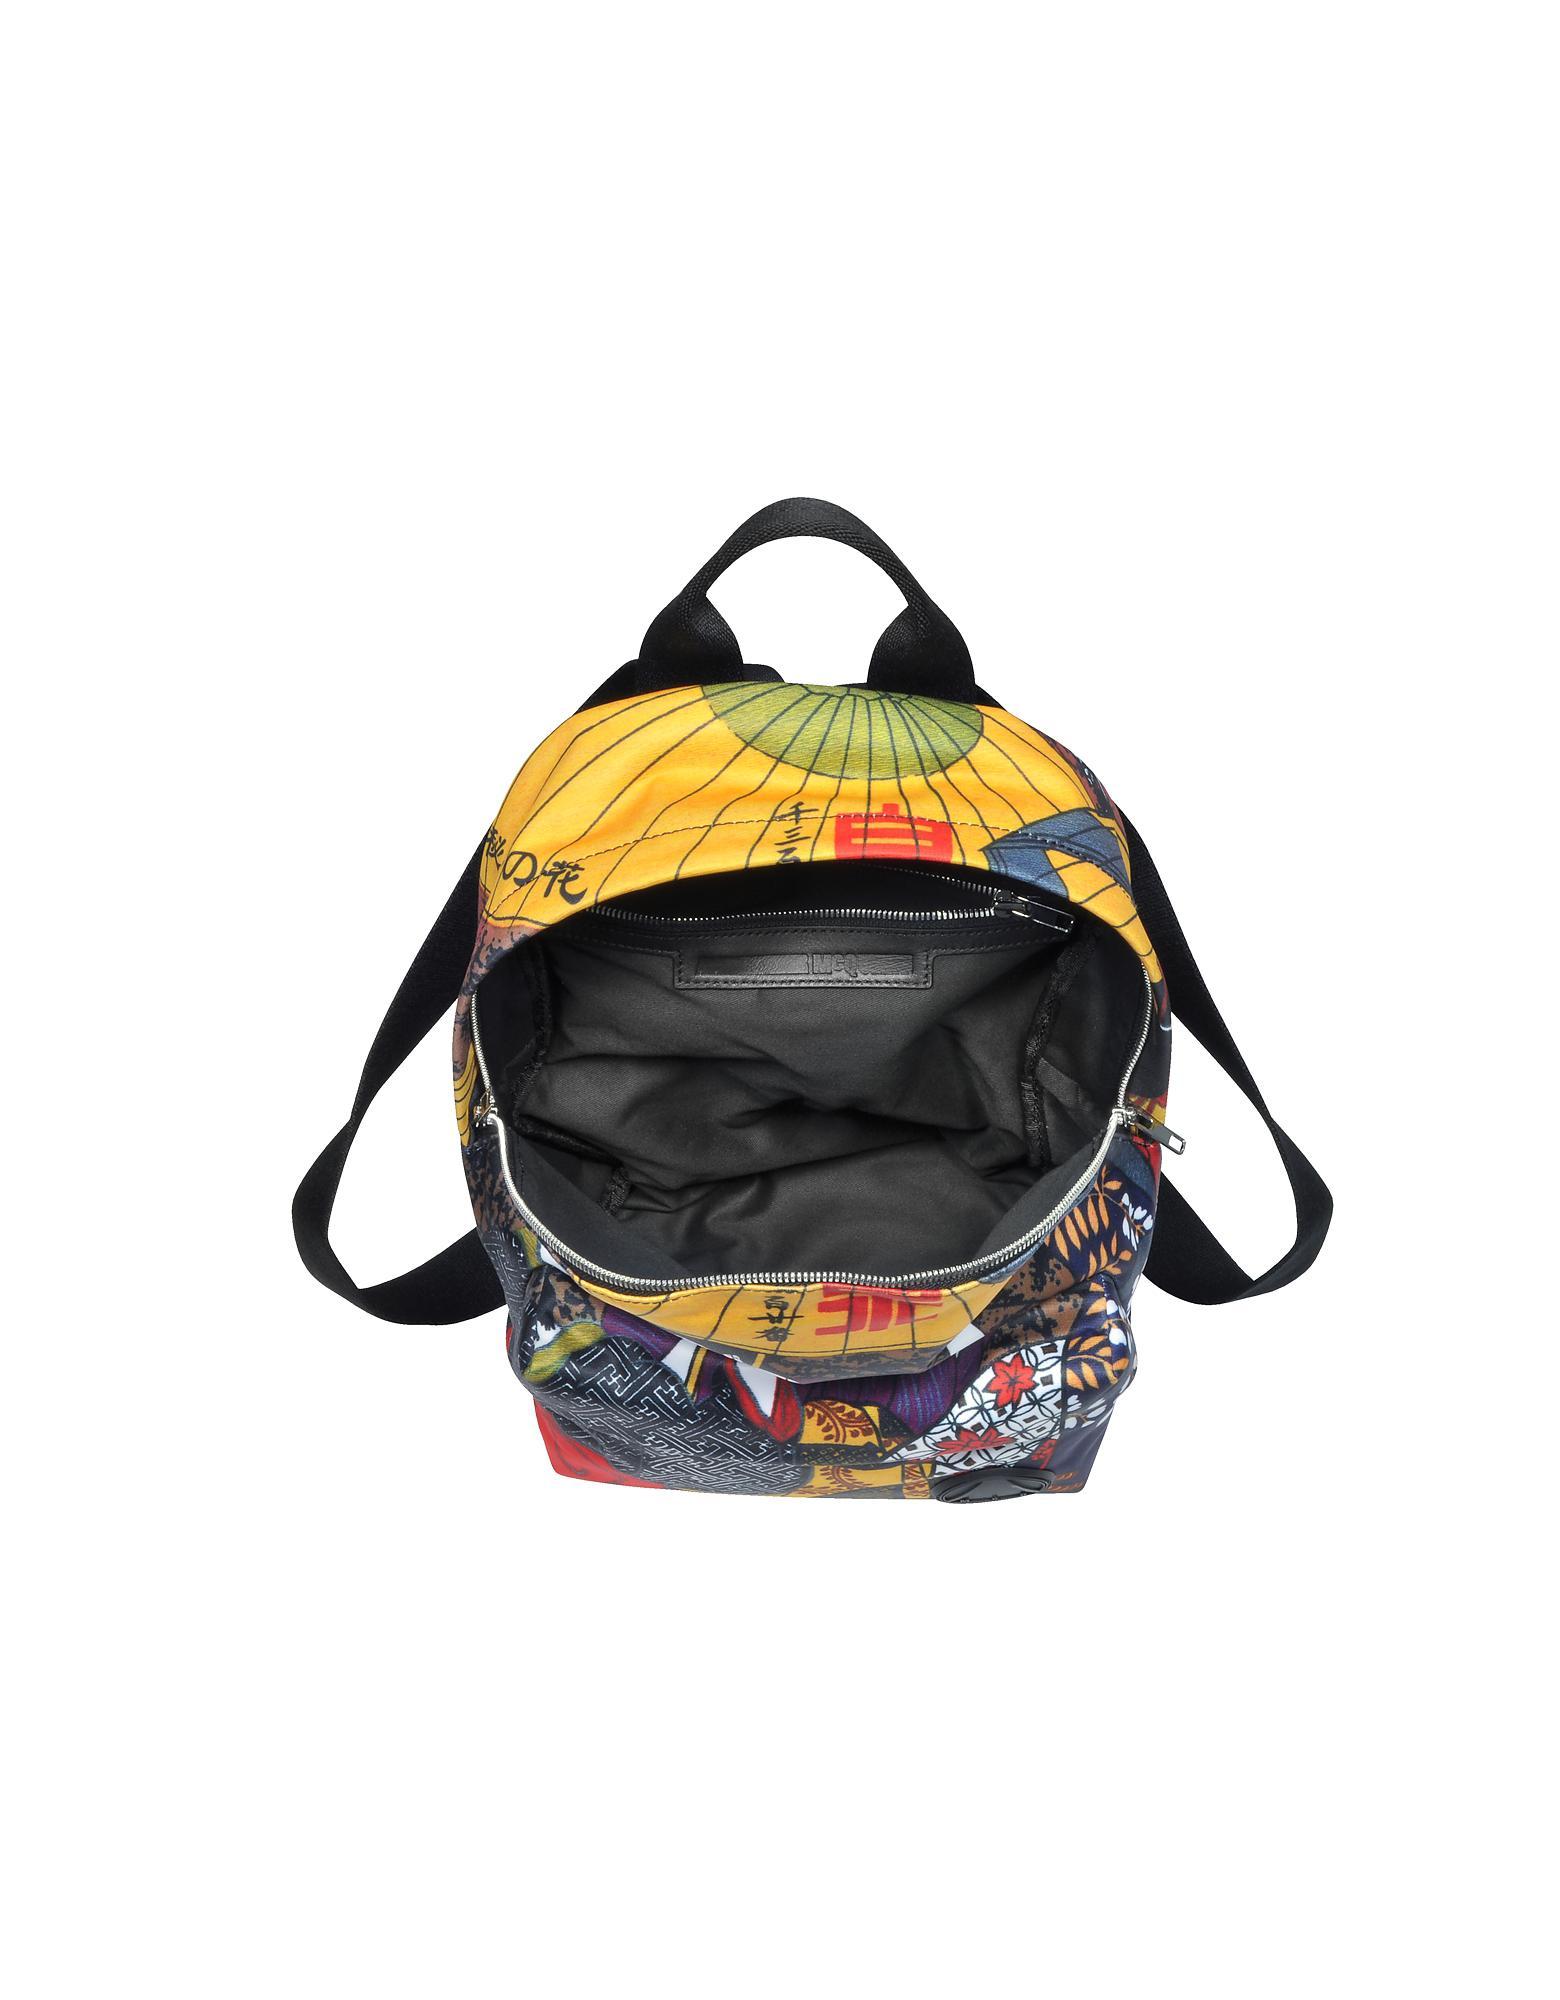 931ab48049a McQ Kimono Girl Nylon Backpack - Lyst